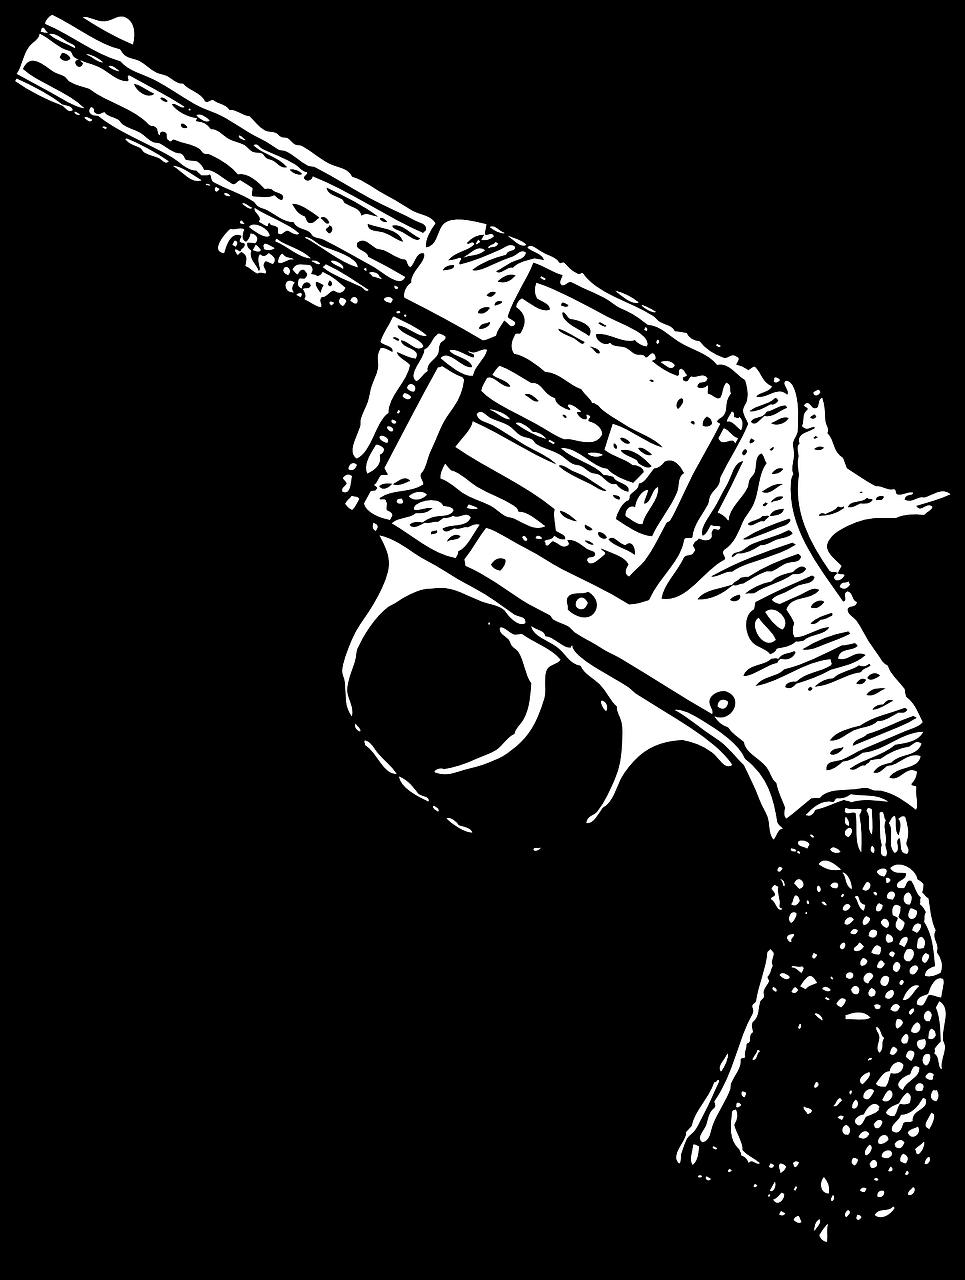 965x1280 Gun Revolver Pistol Weapon Gun Revolver Pistol